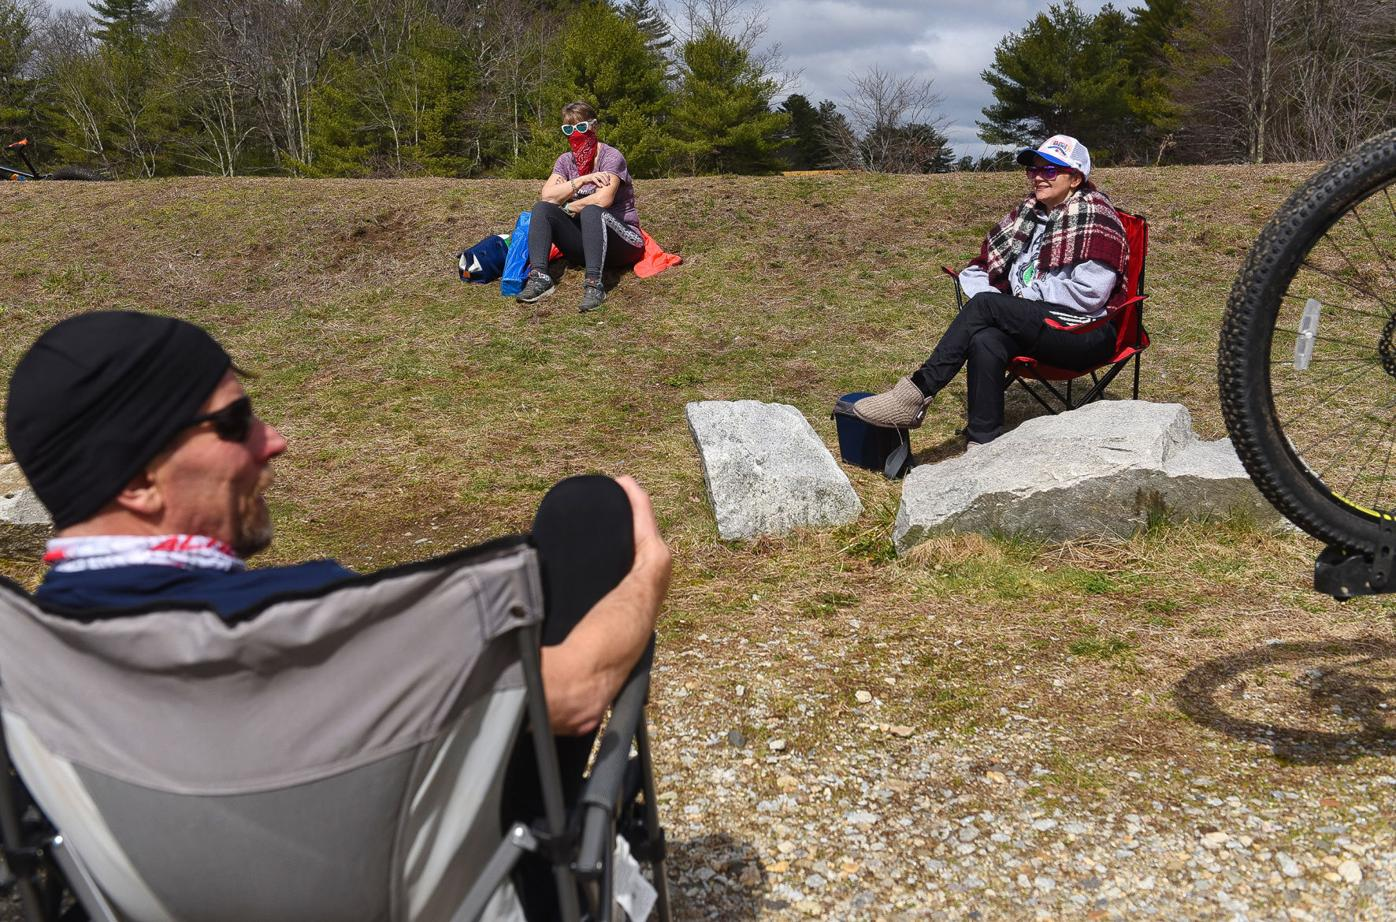 Social distancing bikers, alternative